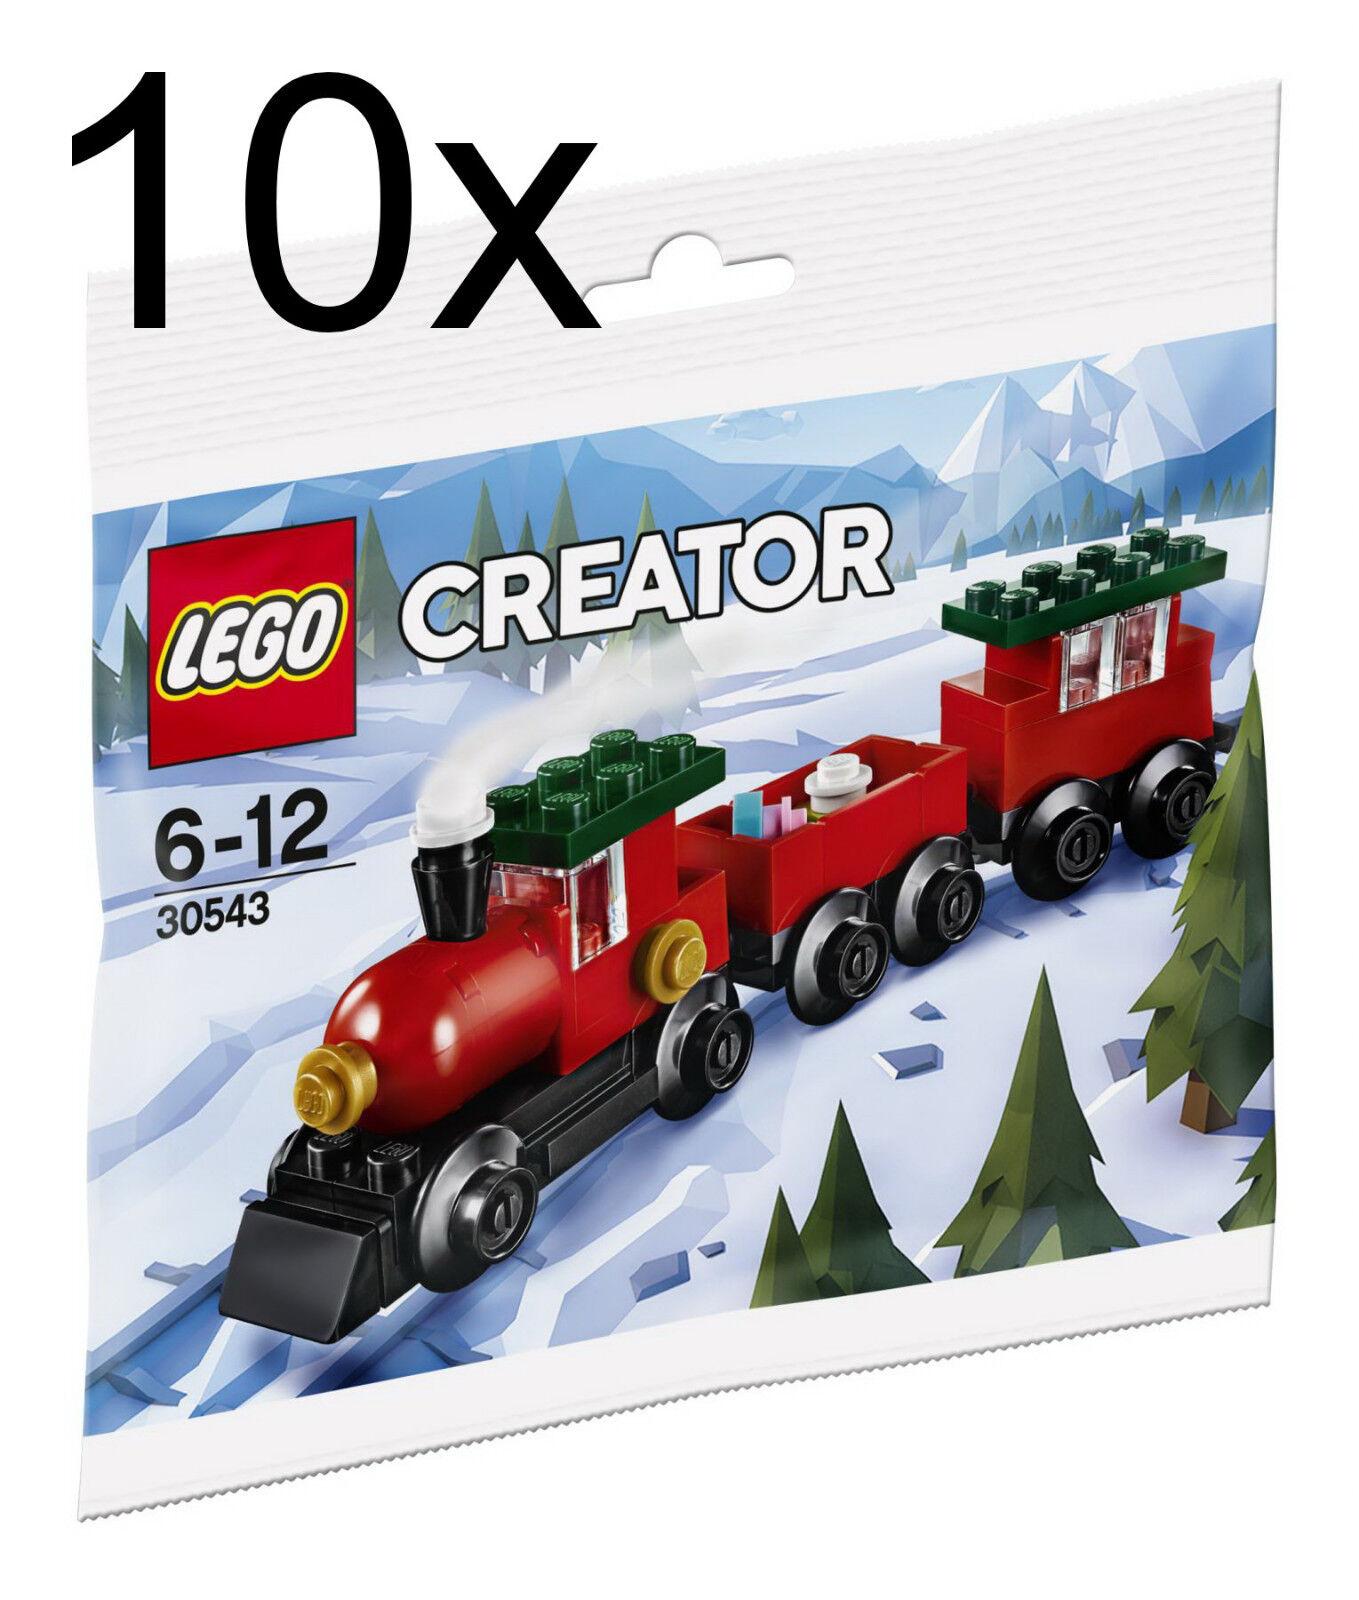 LEGO 10x 30543 Weihnachtszug Polybag - Weihnachten Zug Christmas Train Advent